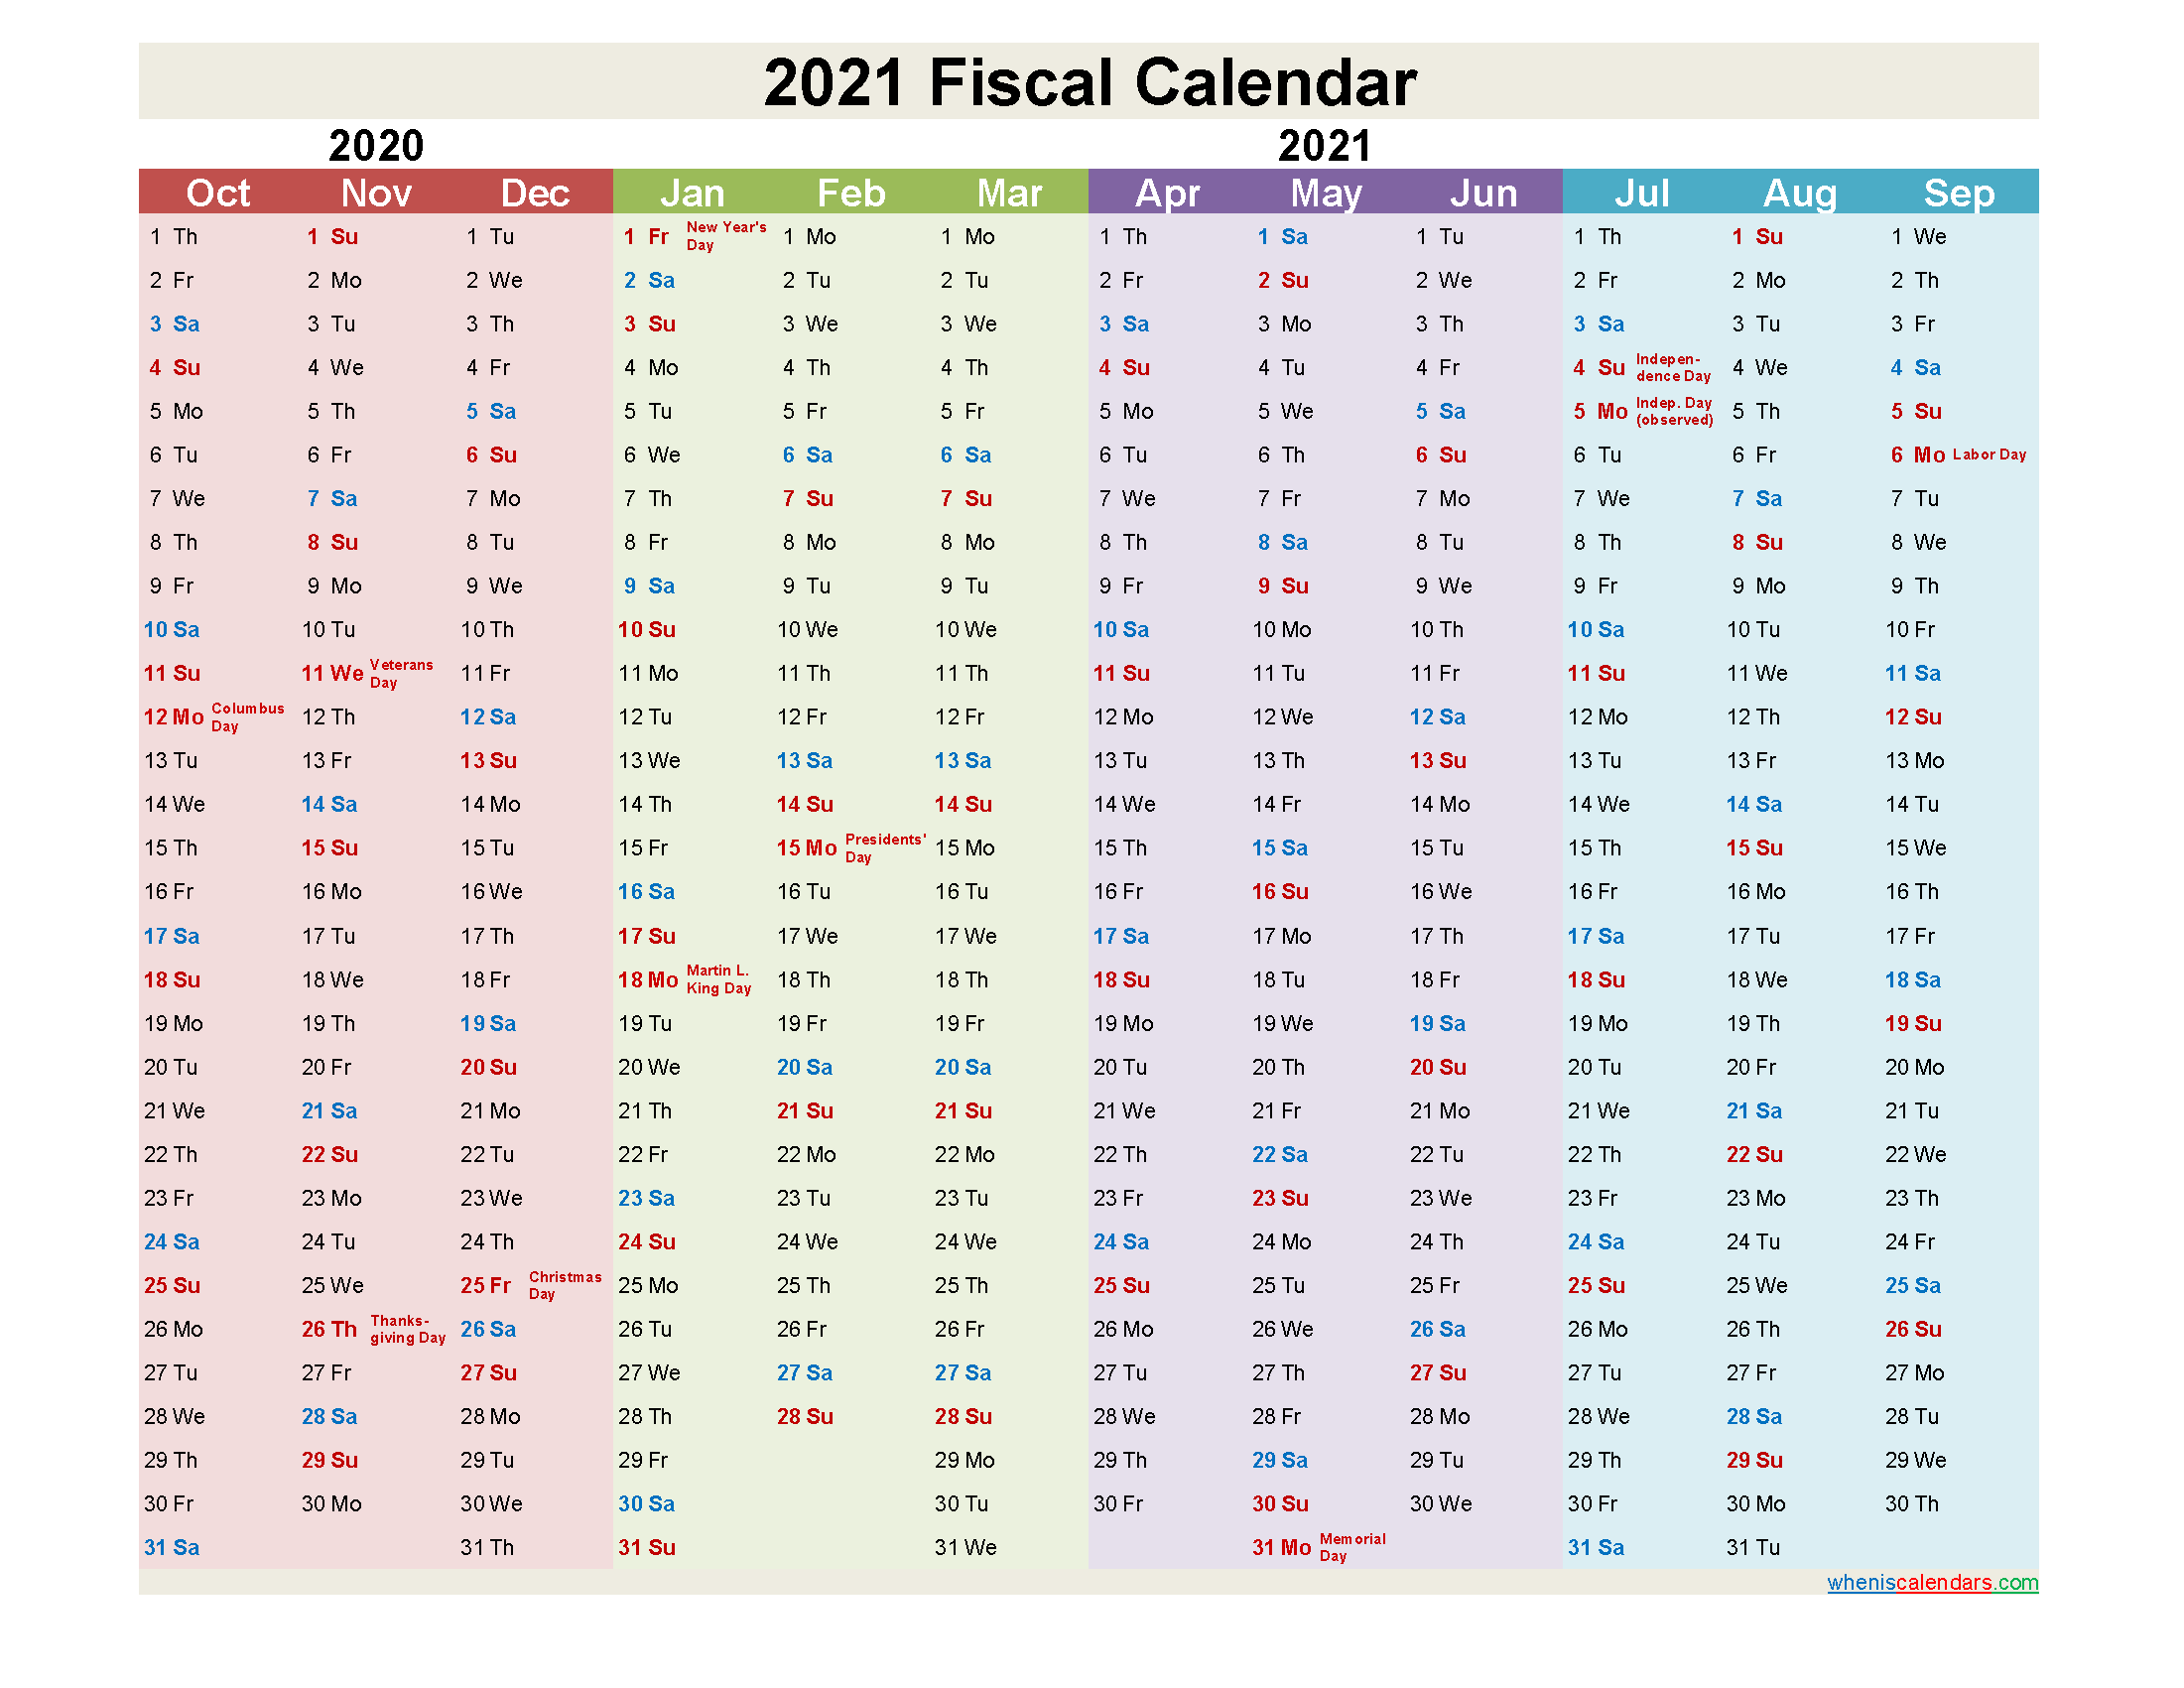 Calendar Quarters 2021 Fiscal Year 2021 Quarters   Template No.fiscal21y6